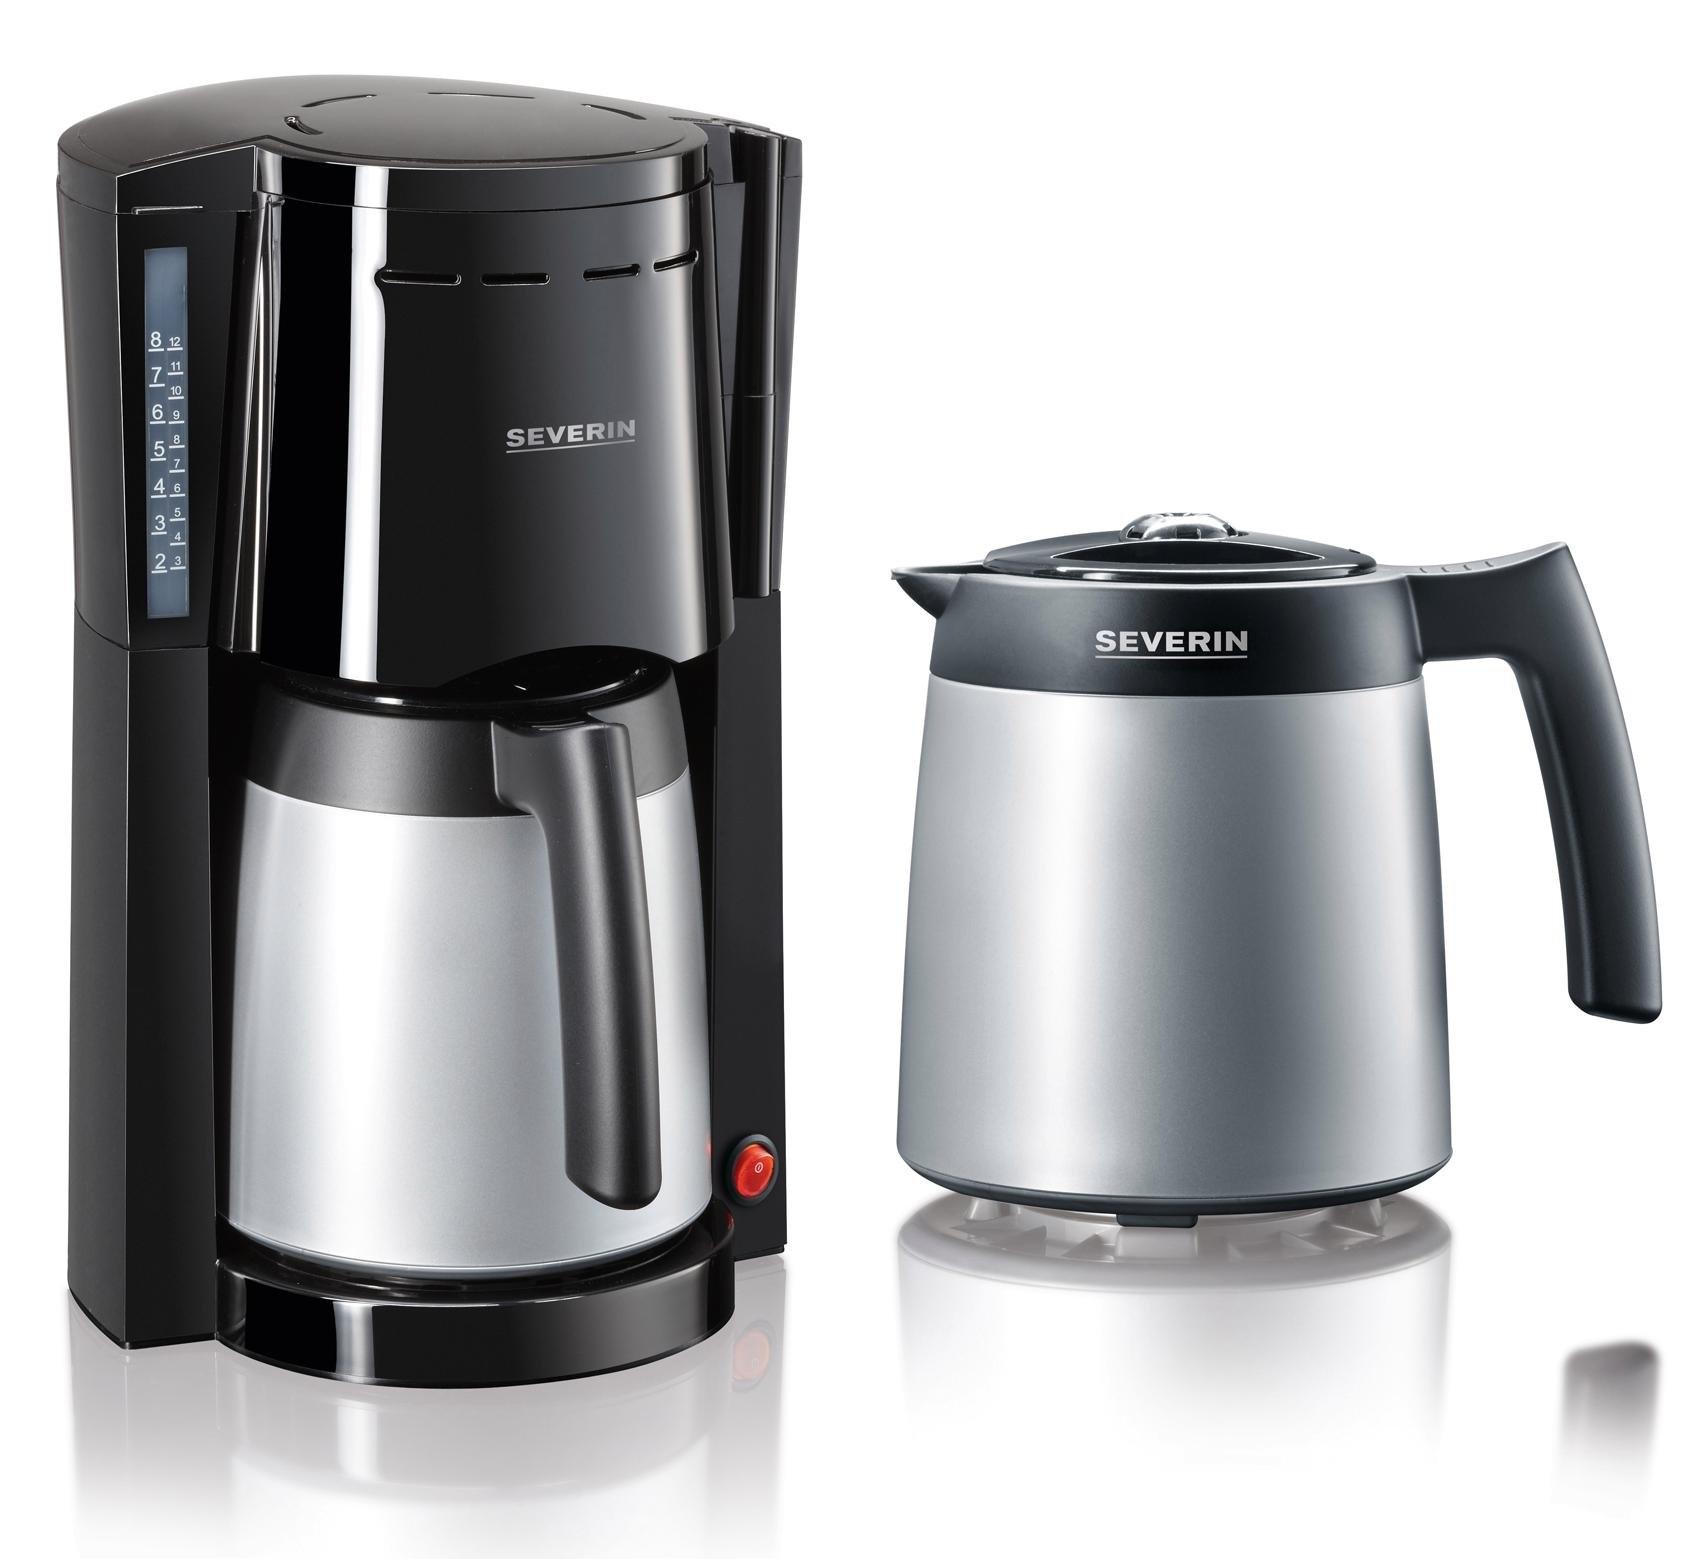 Severin filterkoffiezetapparaat koffiezetapparaat met 2 thermoskannen - KA 9482, papieren filter 1x4 - verschillende betaalmethodes